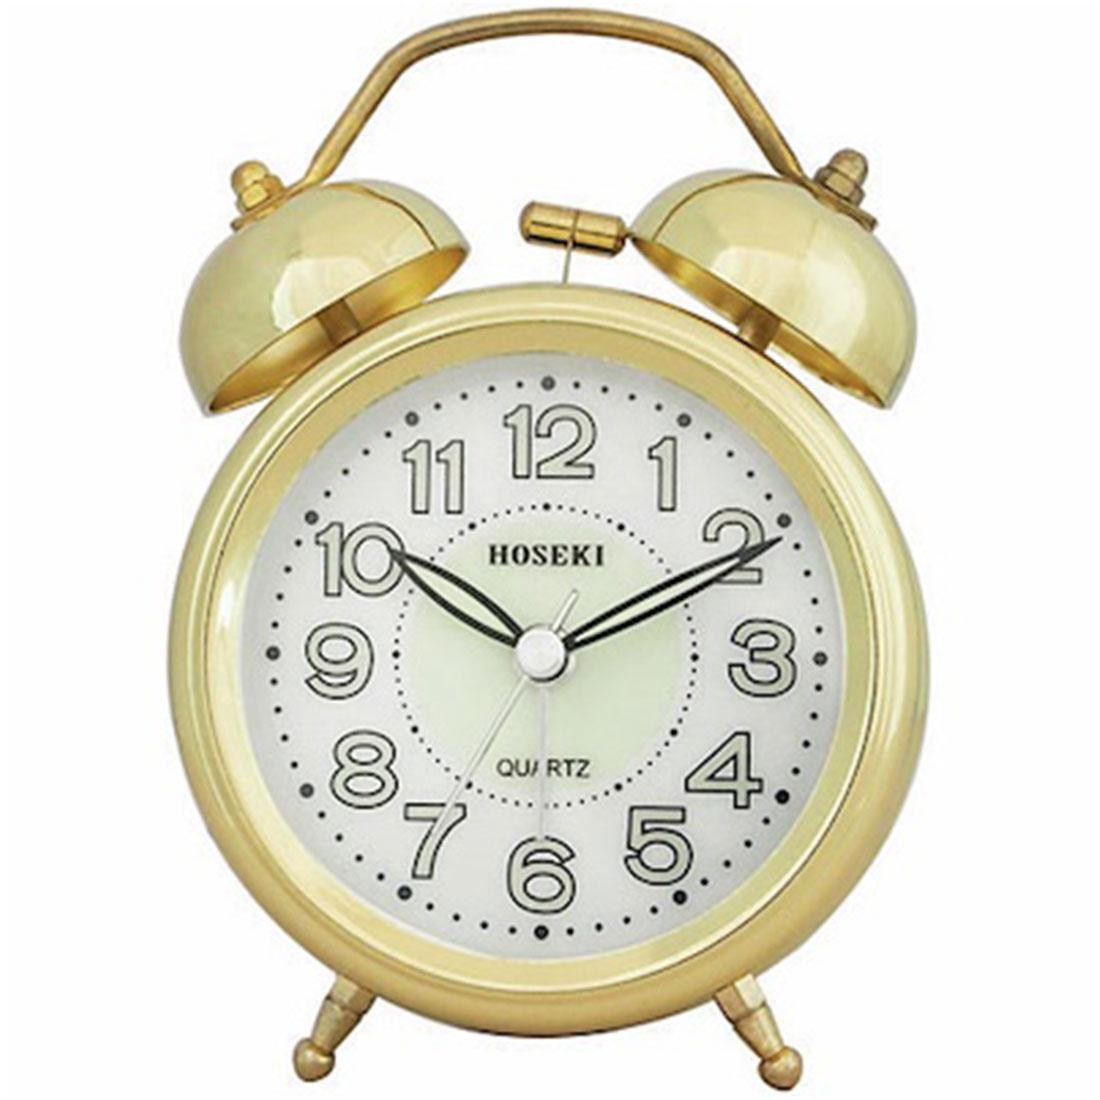 Hoseki H-9062G/W H-9062 Gold Chrome Analog Bell Alarm Clock